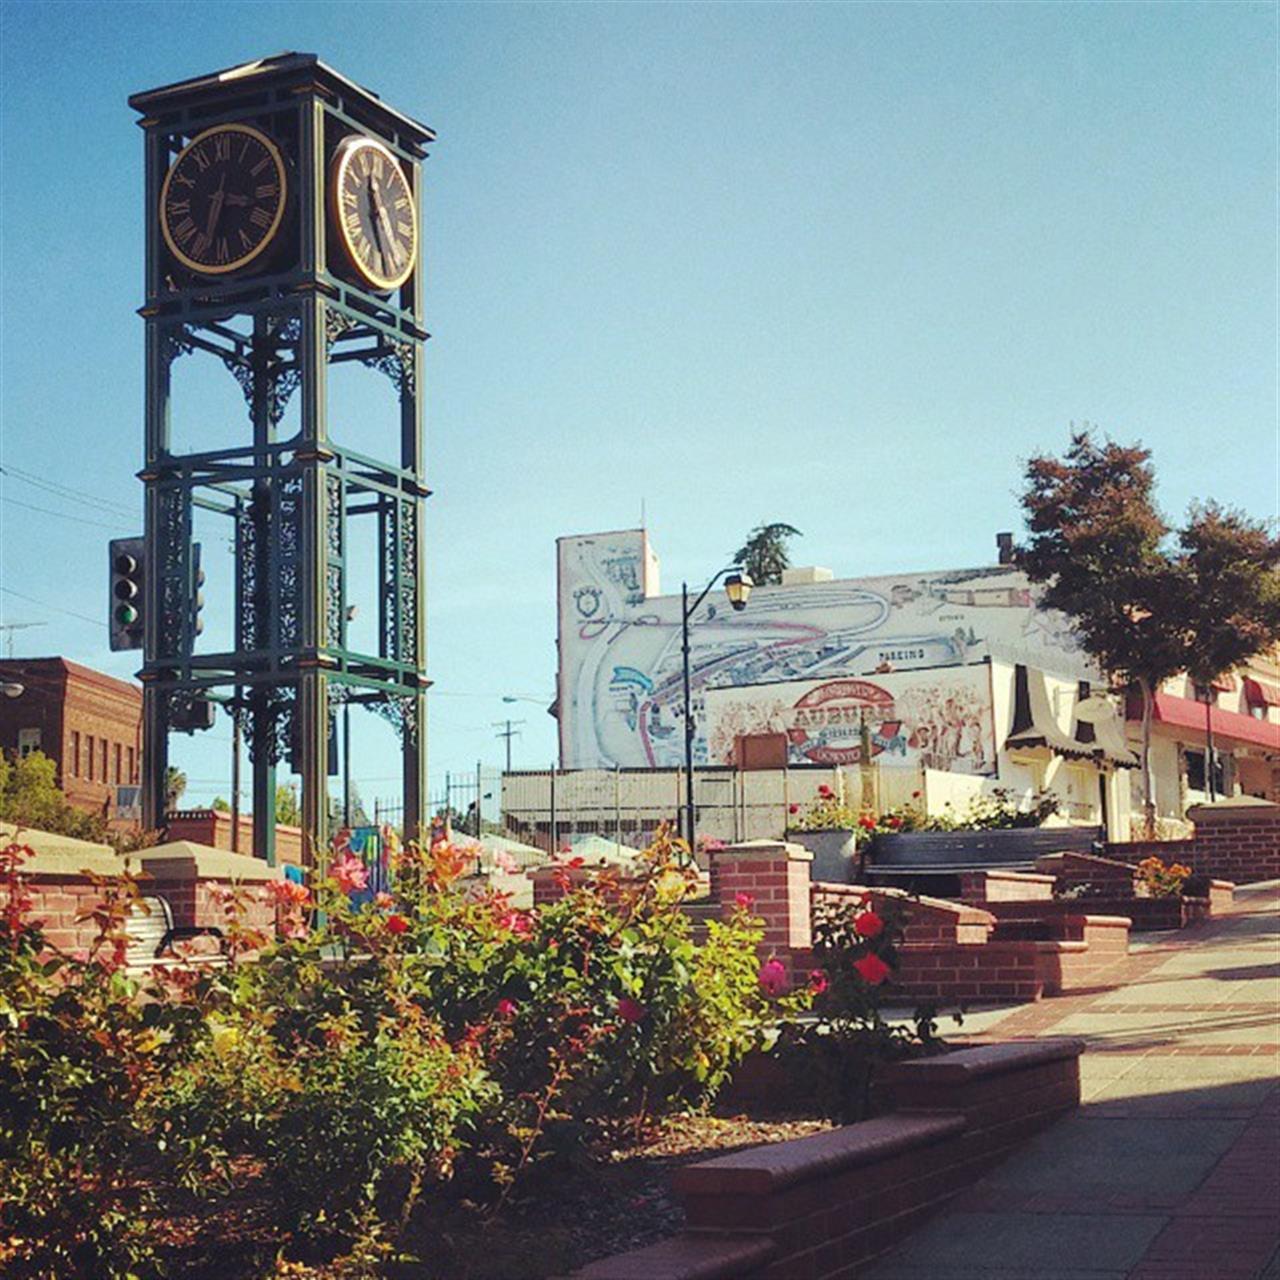 Downtown Auburn, beautiful view of the Auburn clock tower. #leadingrelocal #lyonrealestate #auburnca #downtownauburn #placercounty